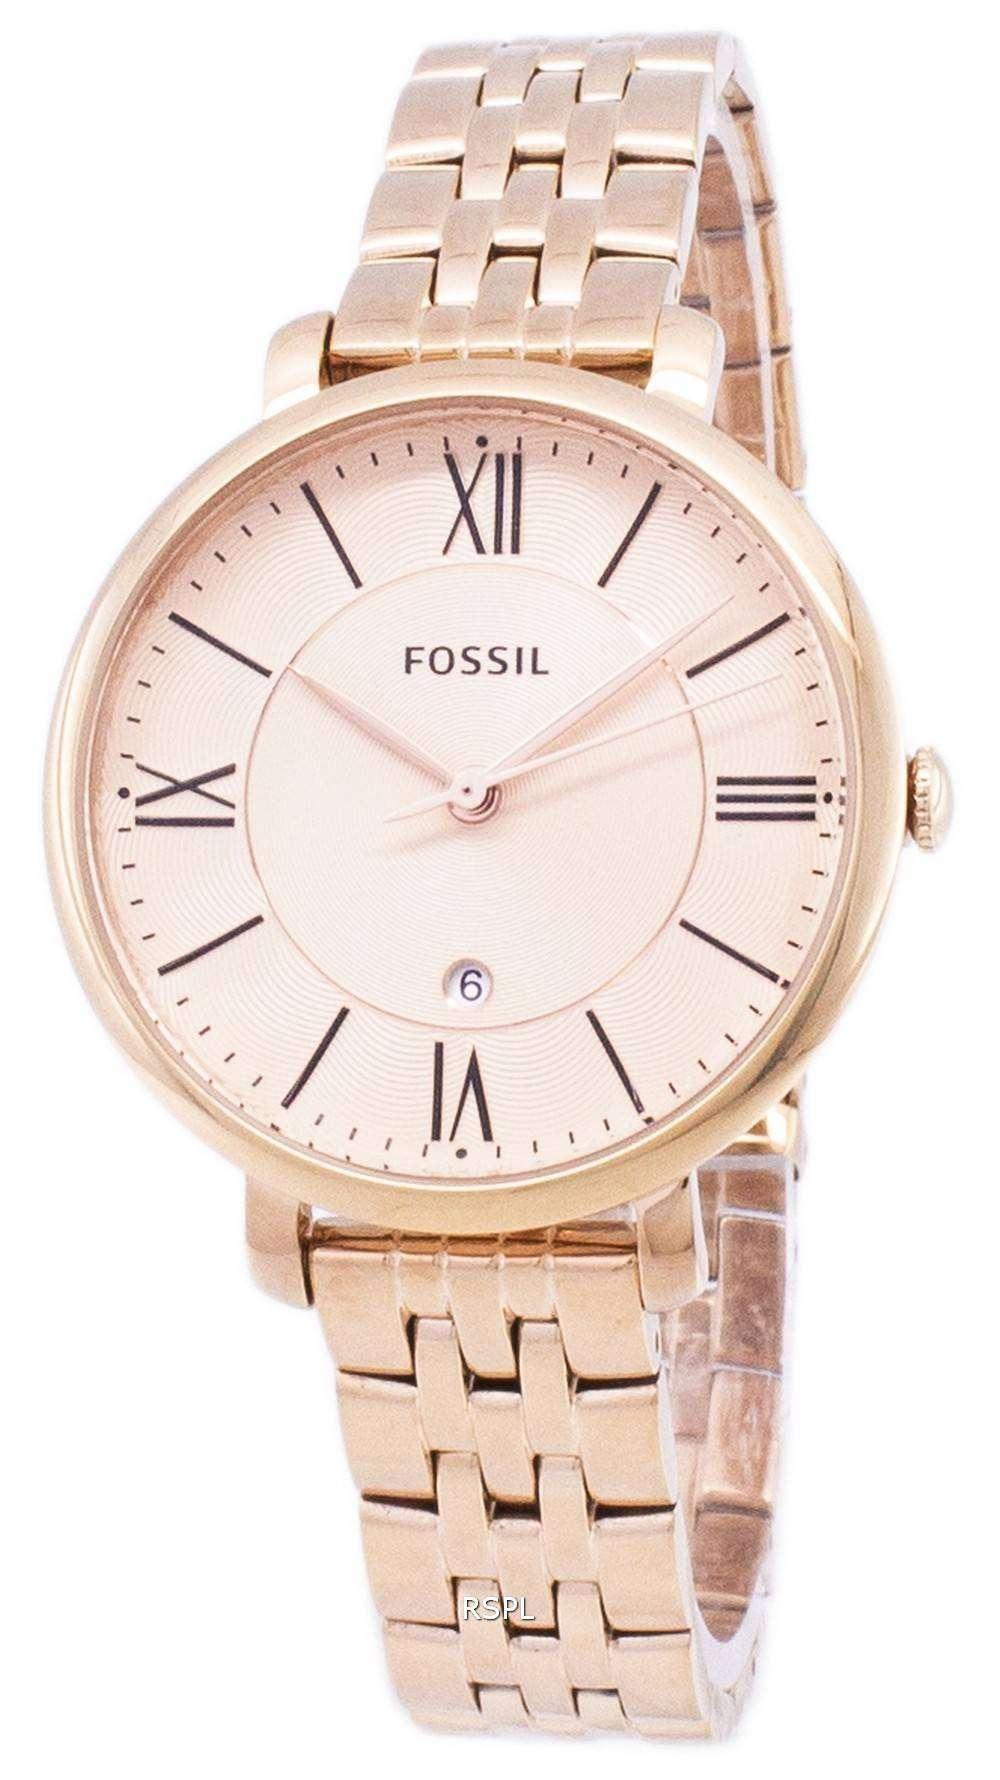 6a7a26650d93 Fósiles Jacqueline rosa dorado analógico ES3435 reloj de mujeres ...